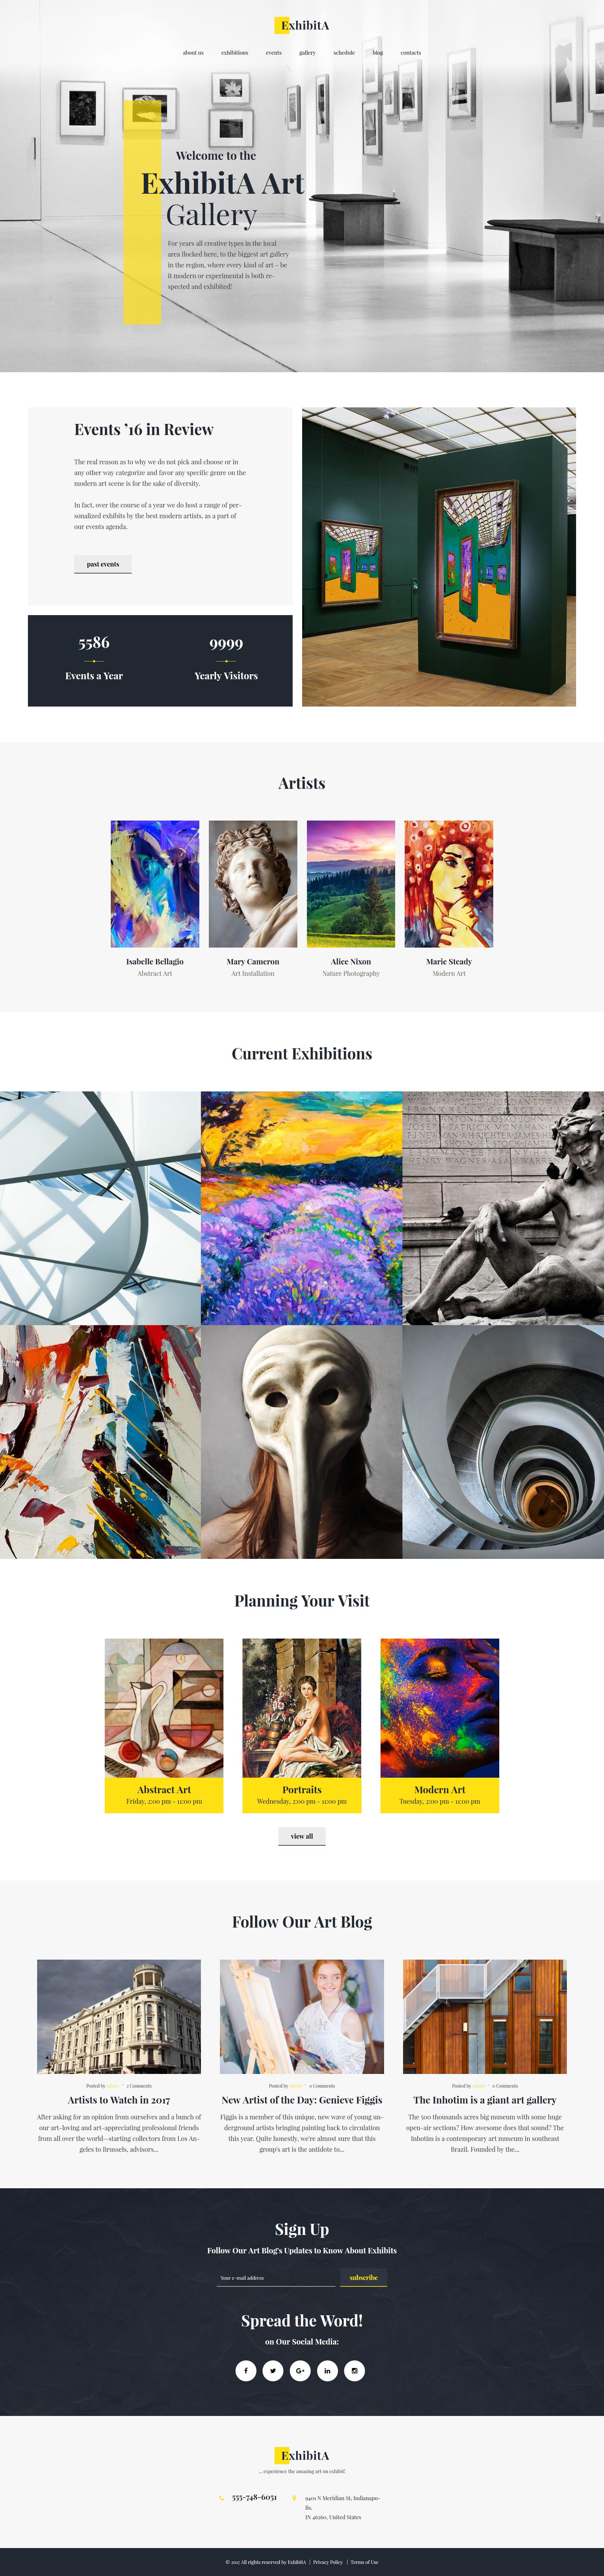 Responsywny motyw WordPress ExhibitA - Art Gallery Responsive #62373 - zrzut ekranu